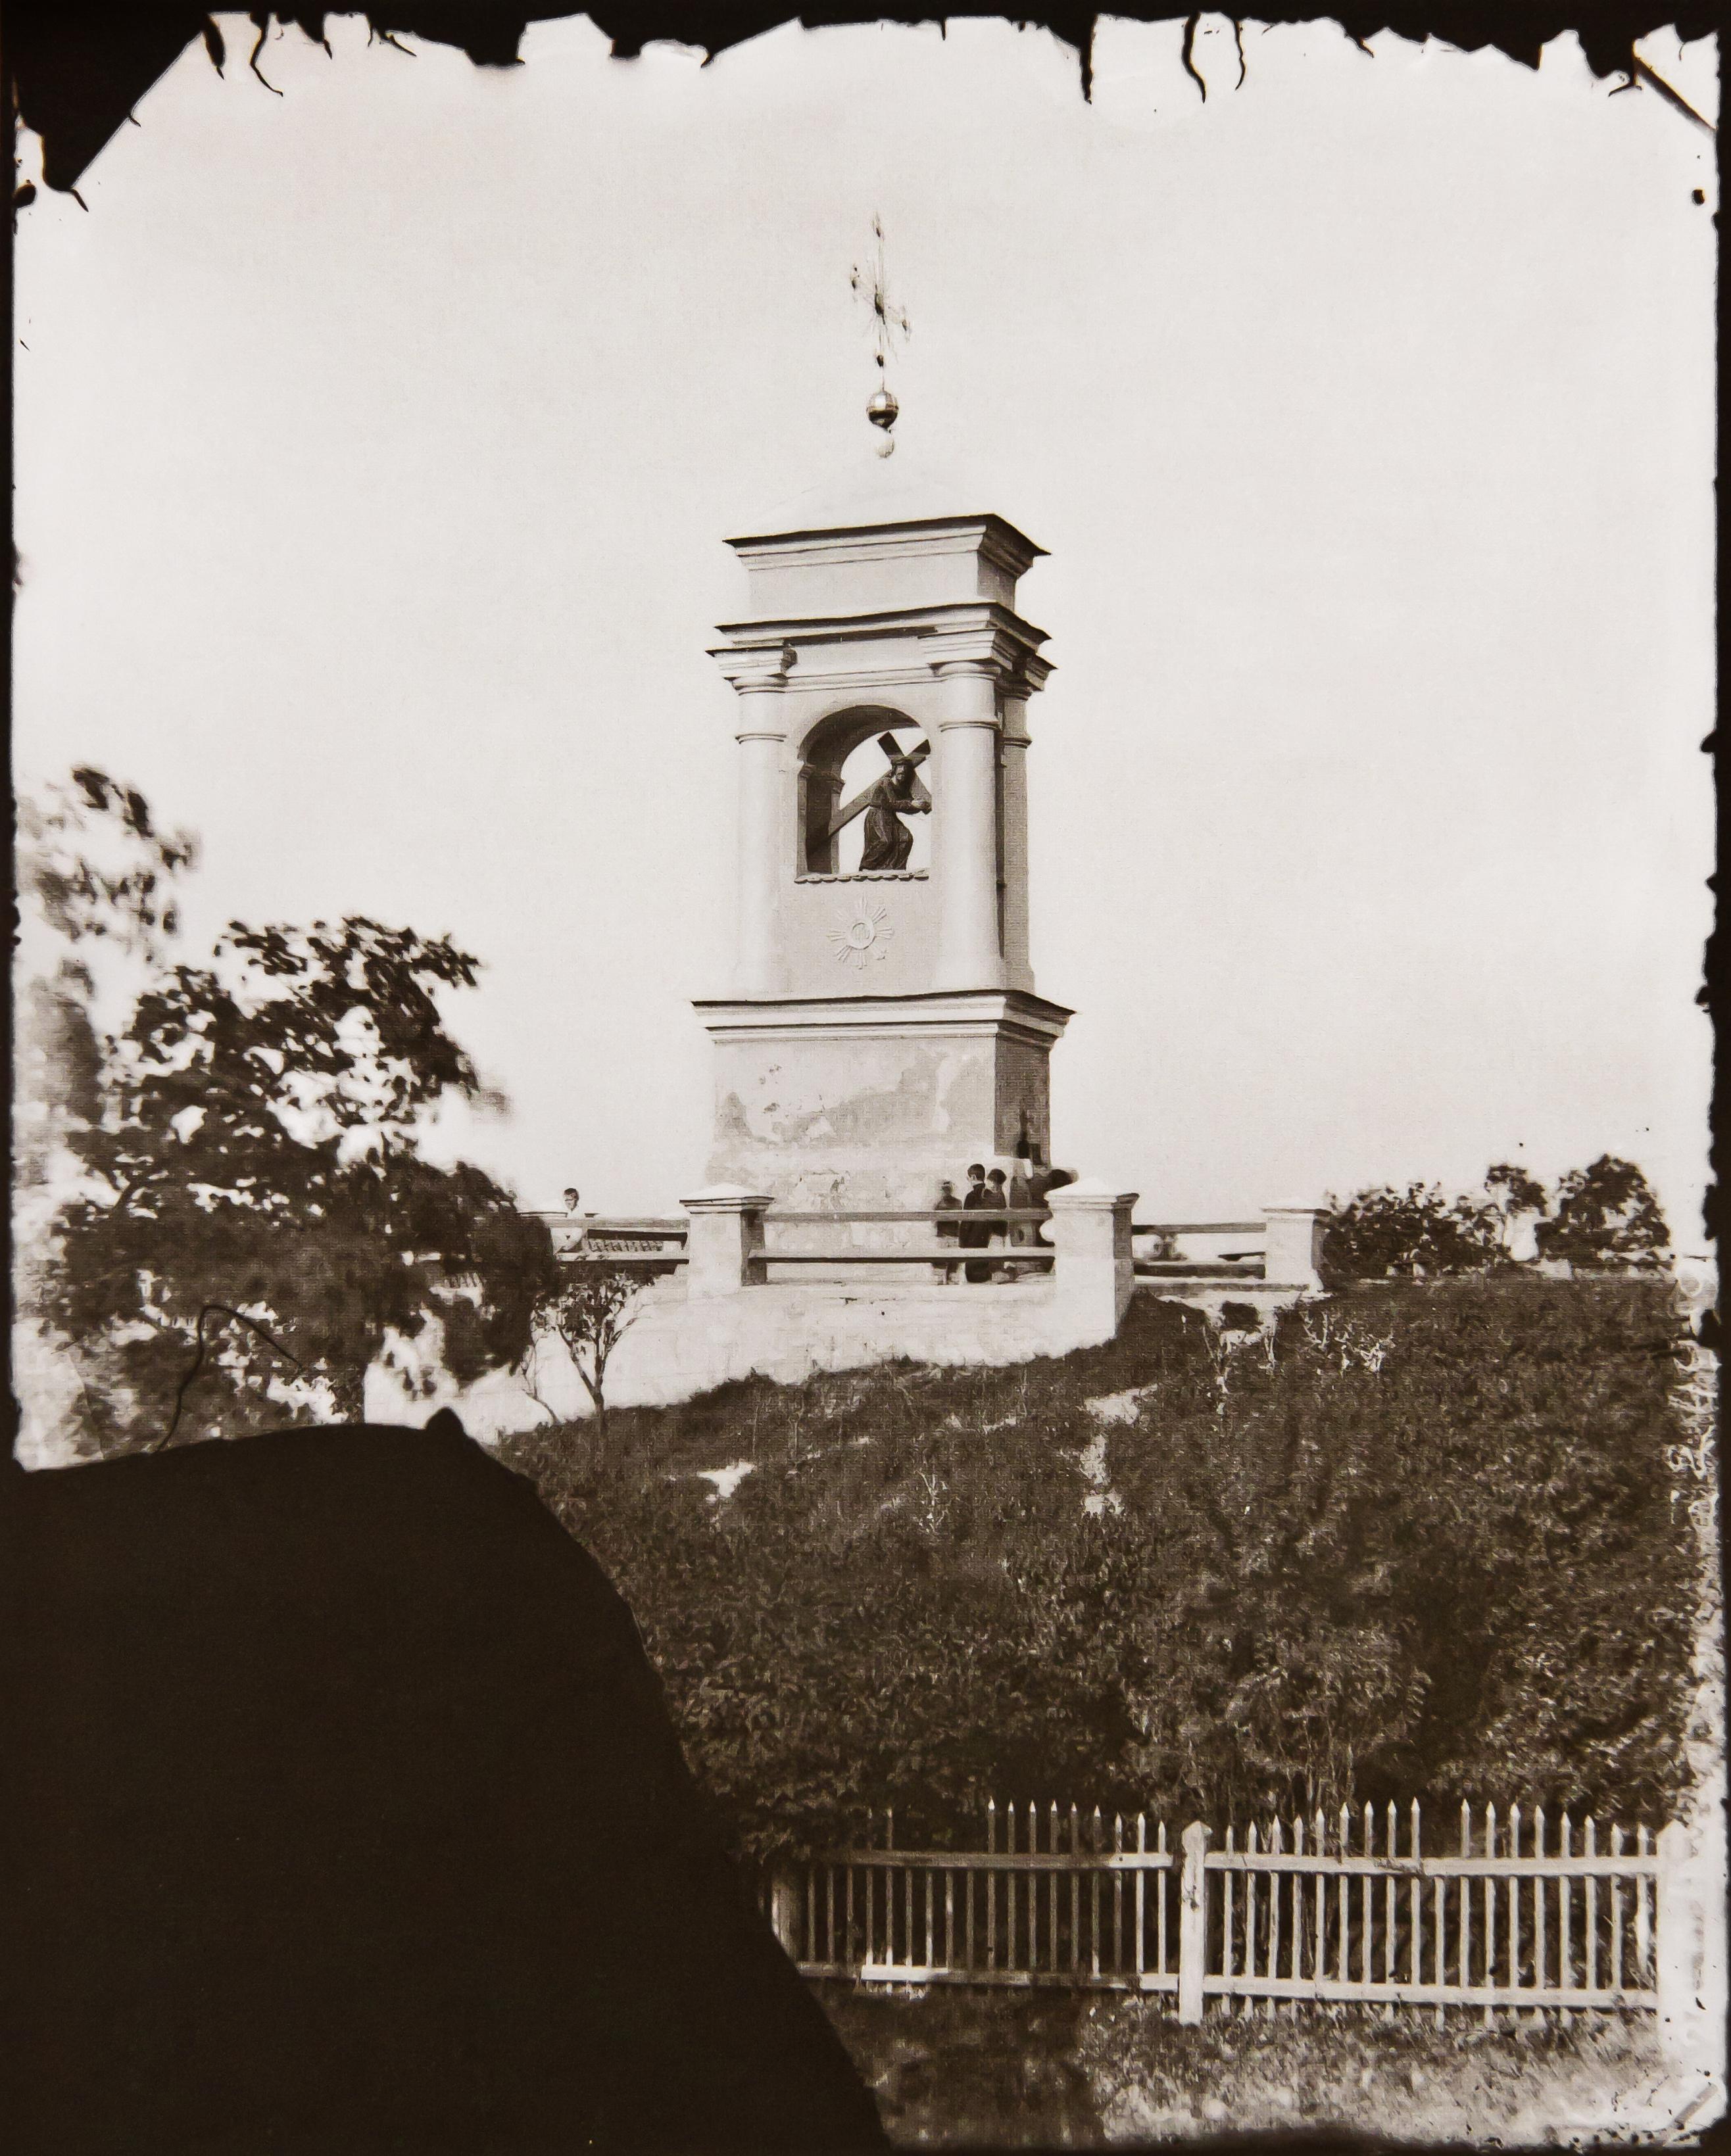 Часовня Спасителя Иисуса Христа в Снипишках возле костёла Святого архангела Рафаила. 1870-е